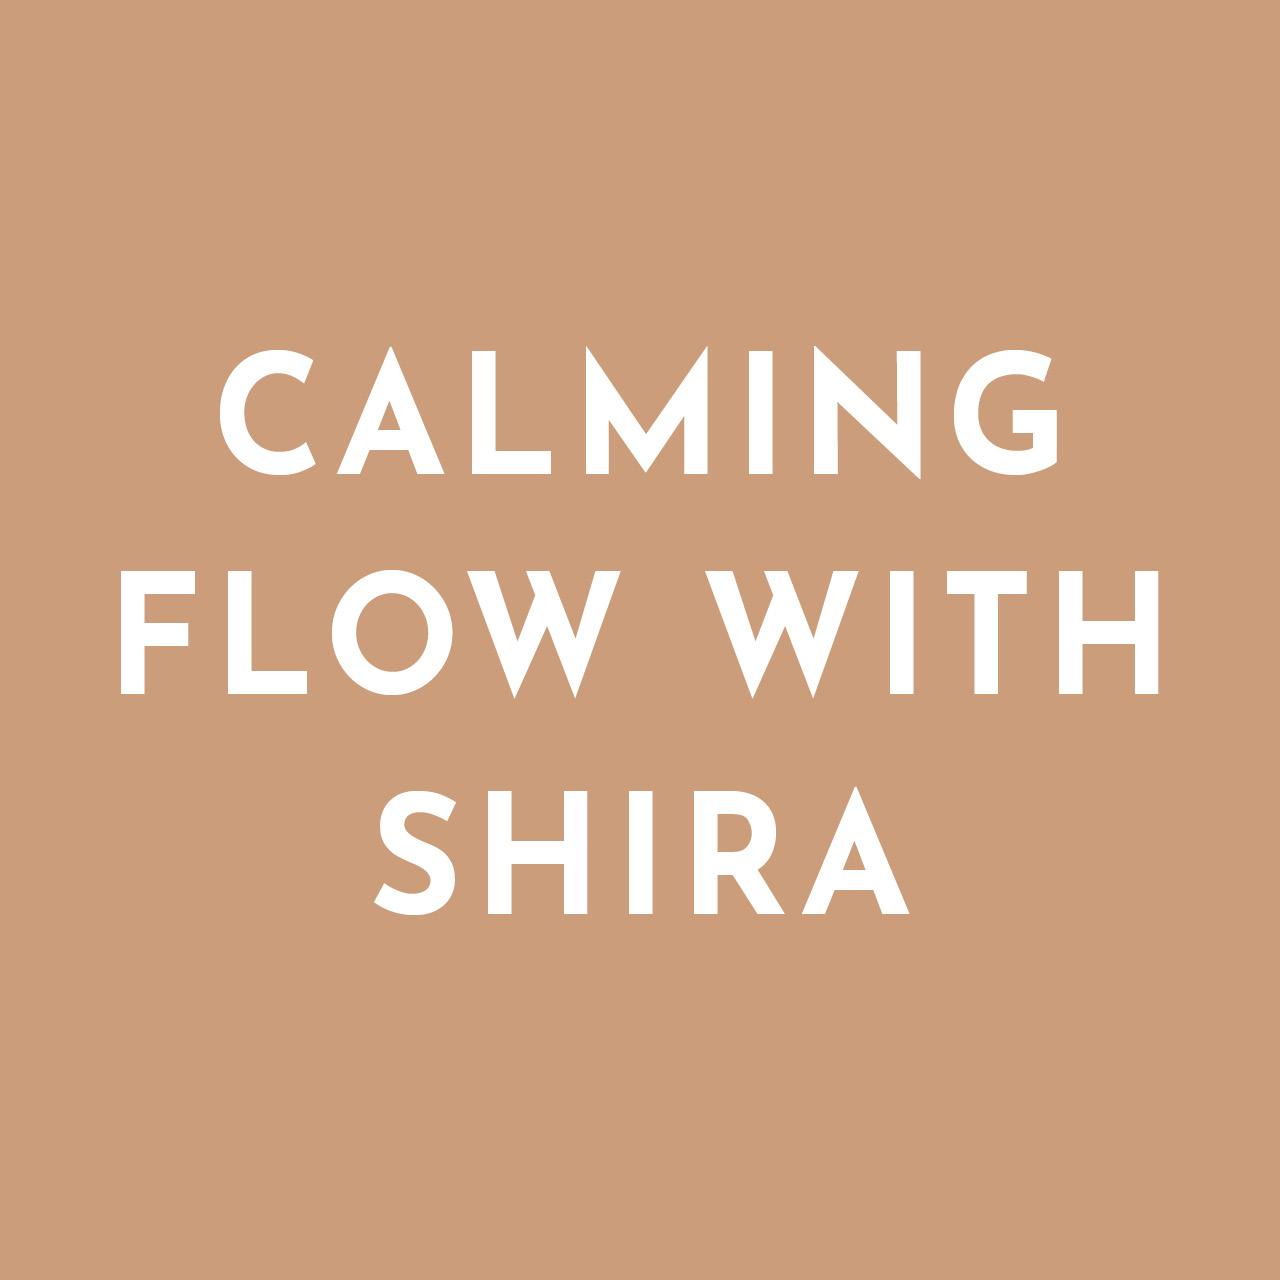 calming-flow-with-shira-hess-yogahome